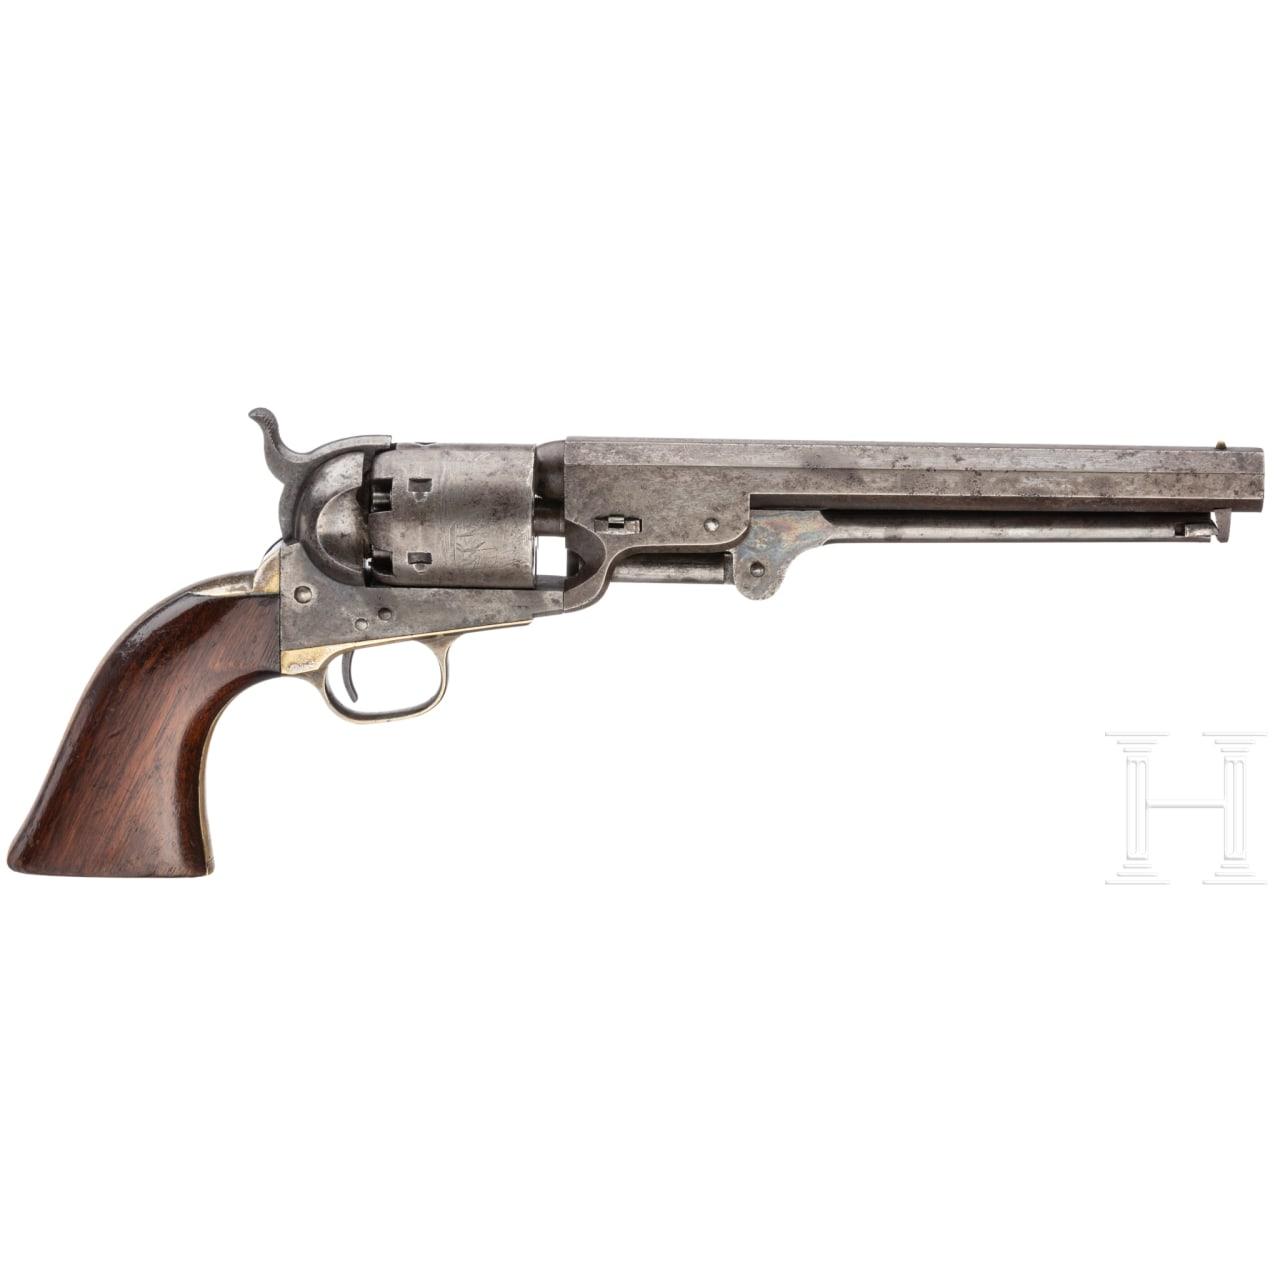 Colt Mod. 1851 Navy